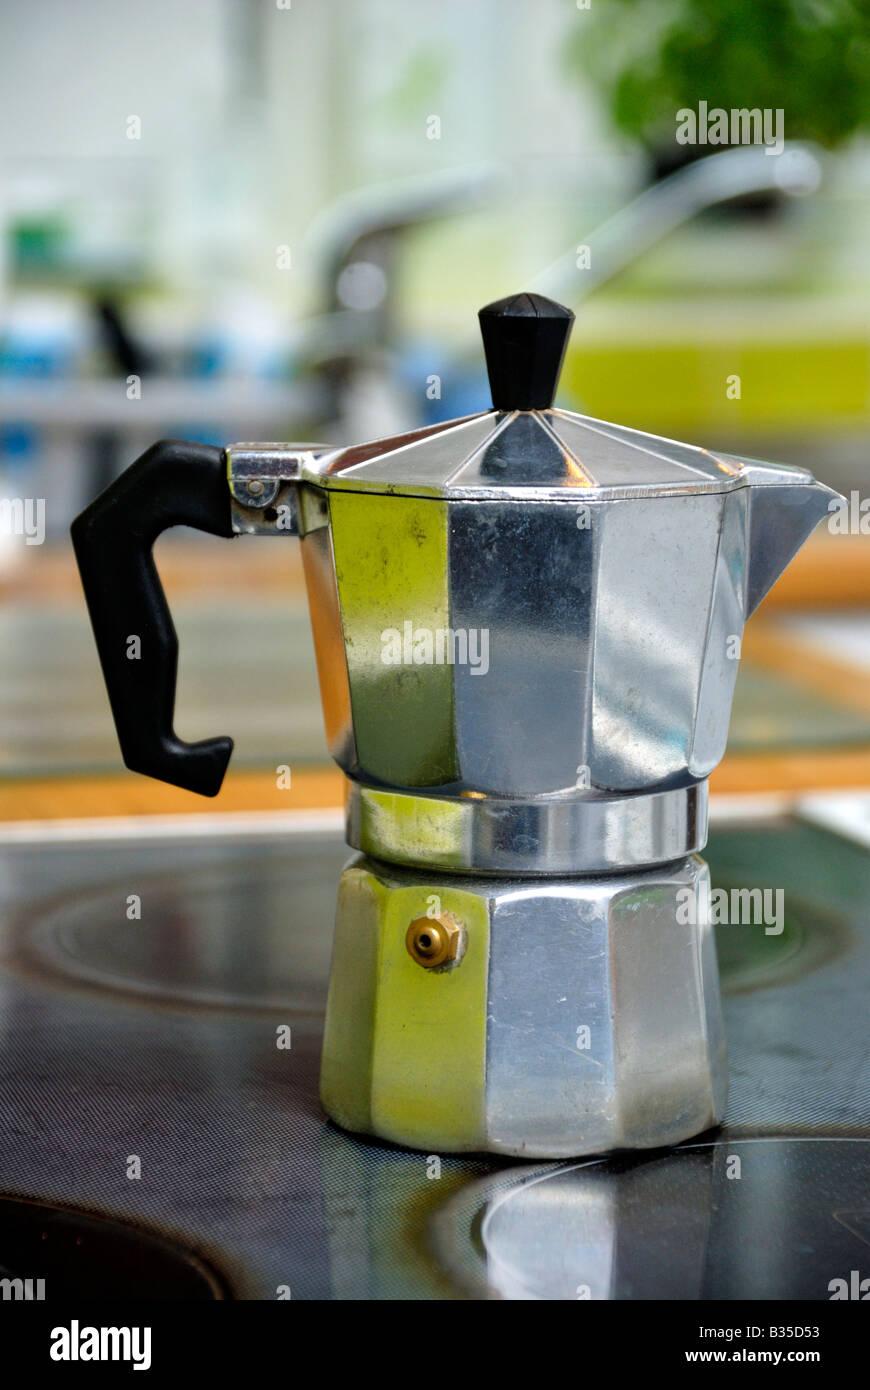 Stovetop moka espresso maker - Stock Image